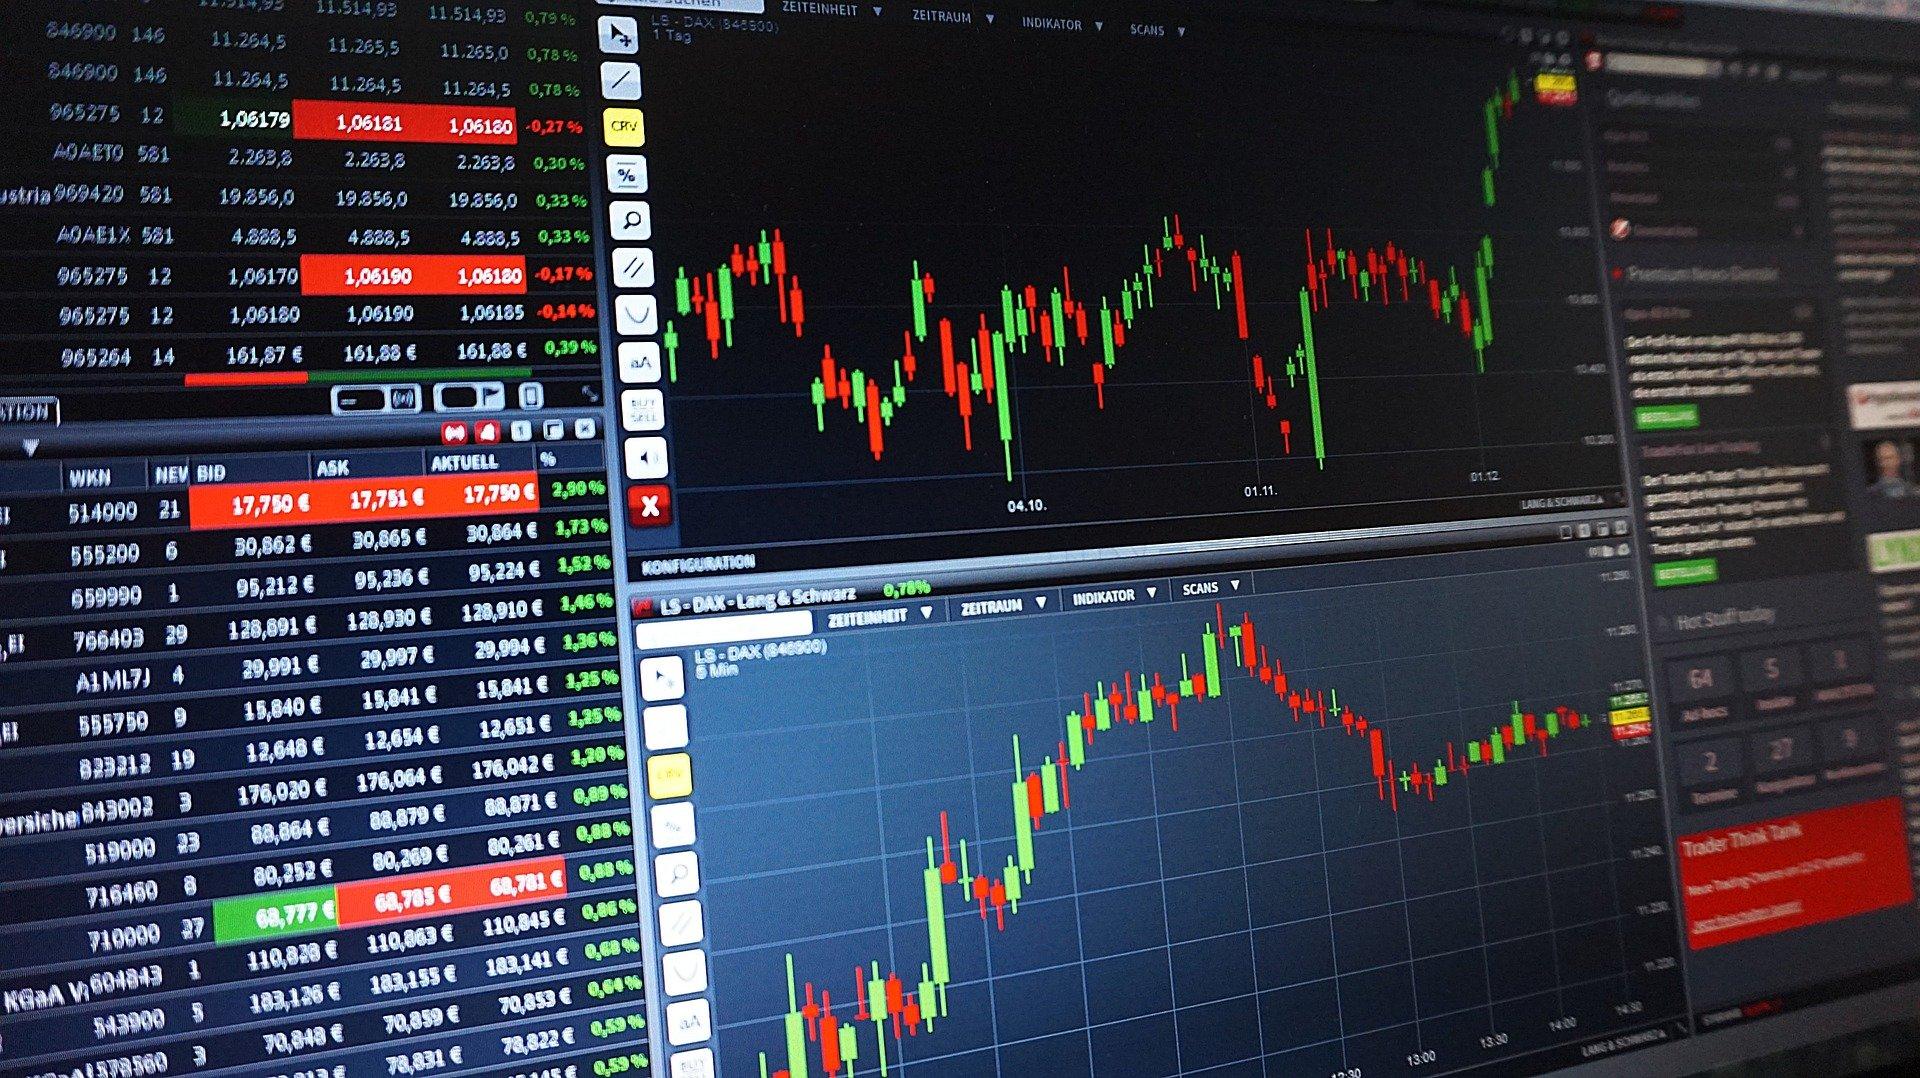 CoiniBank trading platform